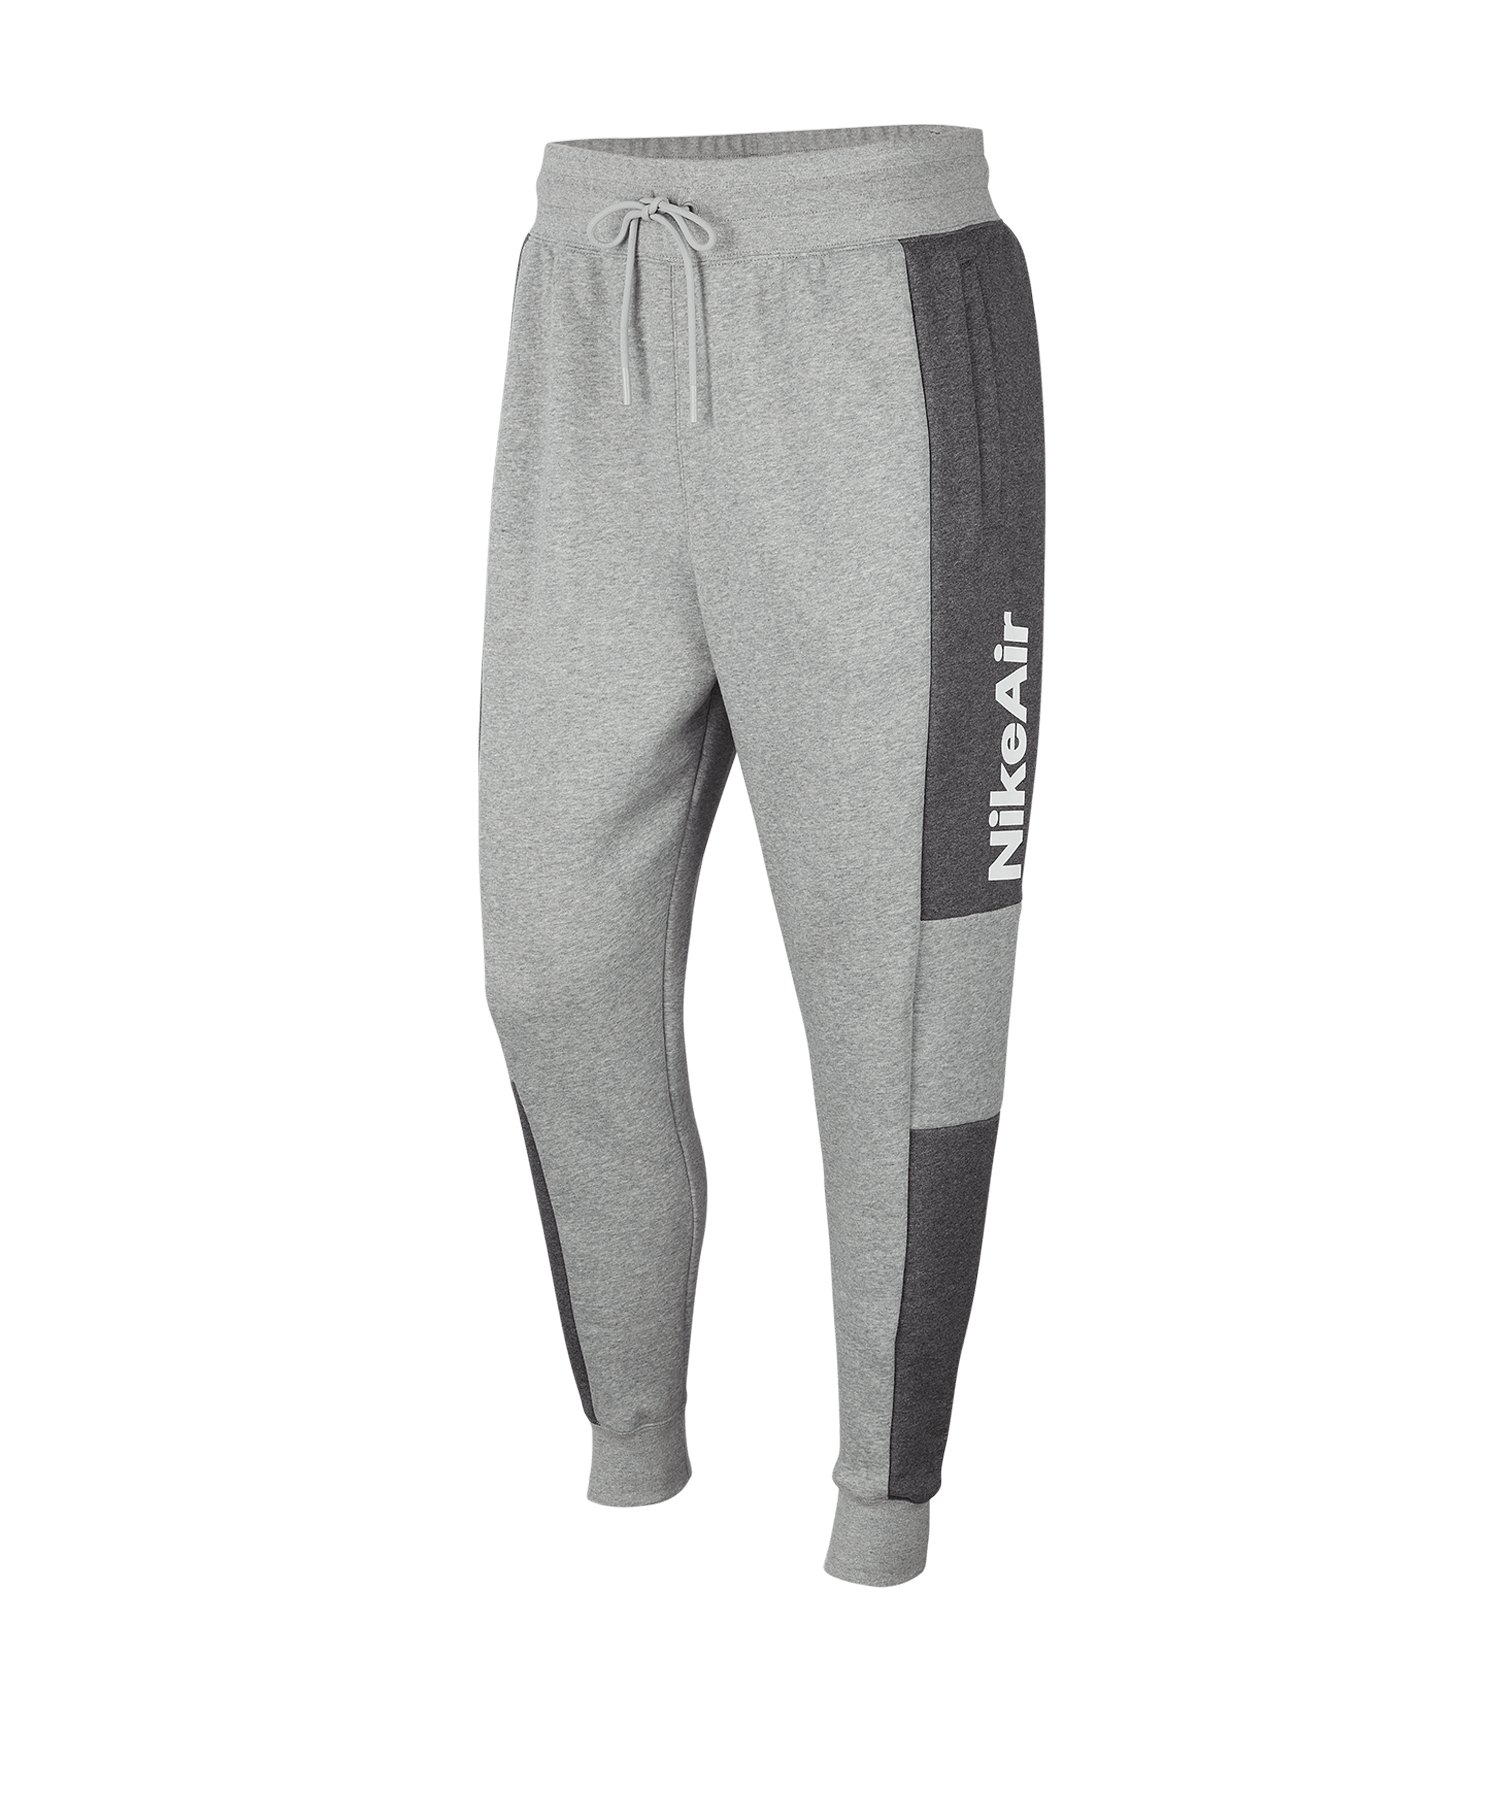 Nike Air Fleece Jogginghose Grau F063 - grau